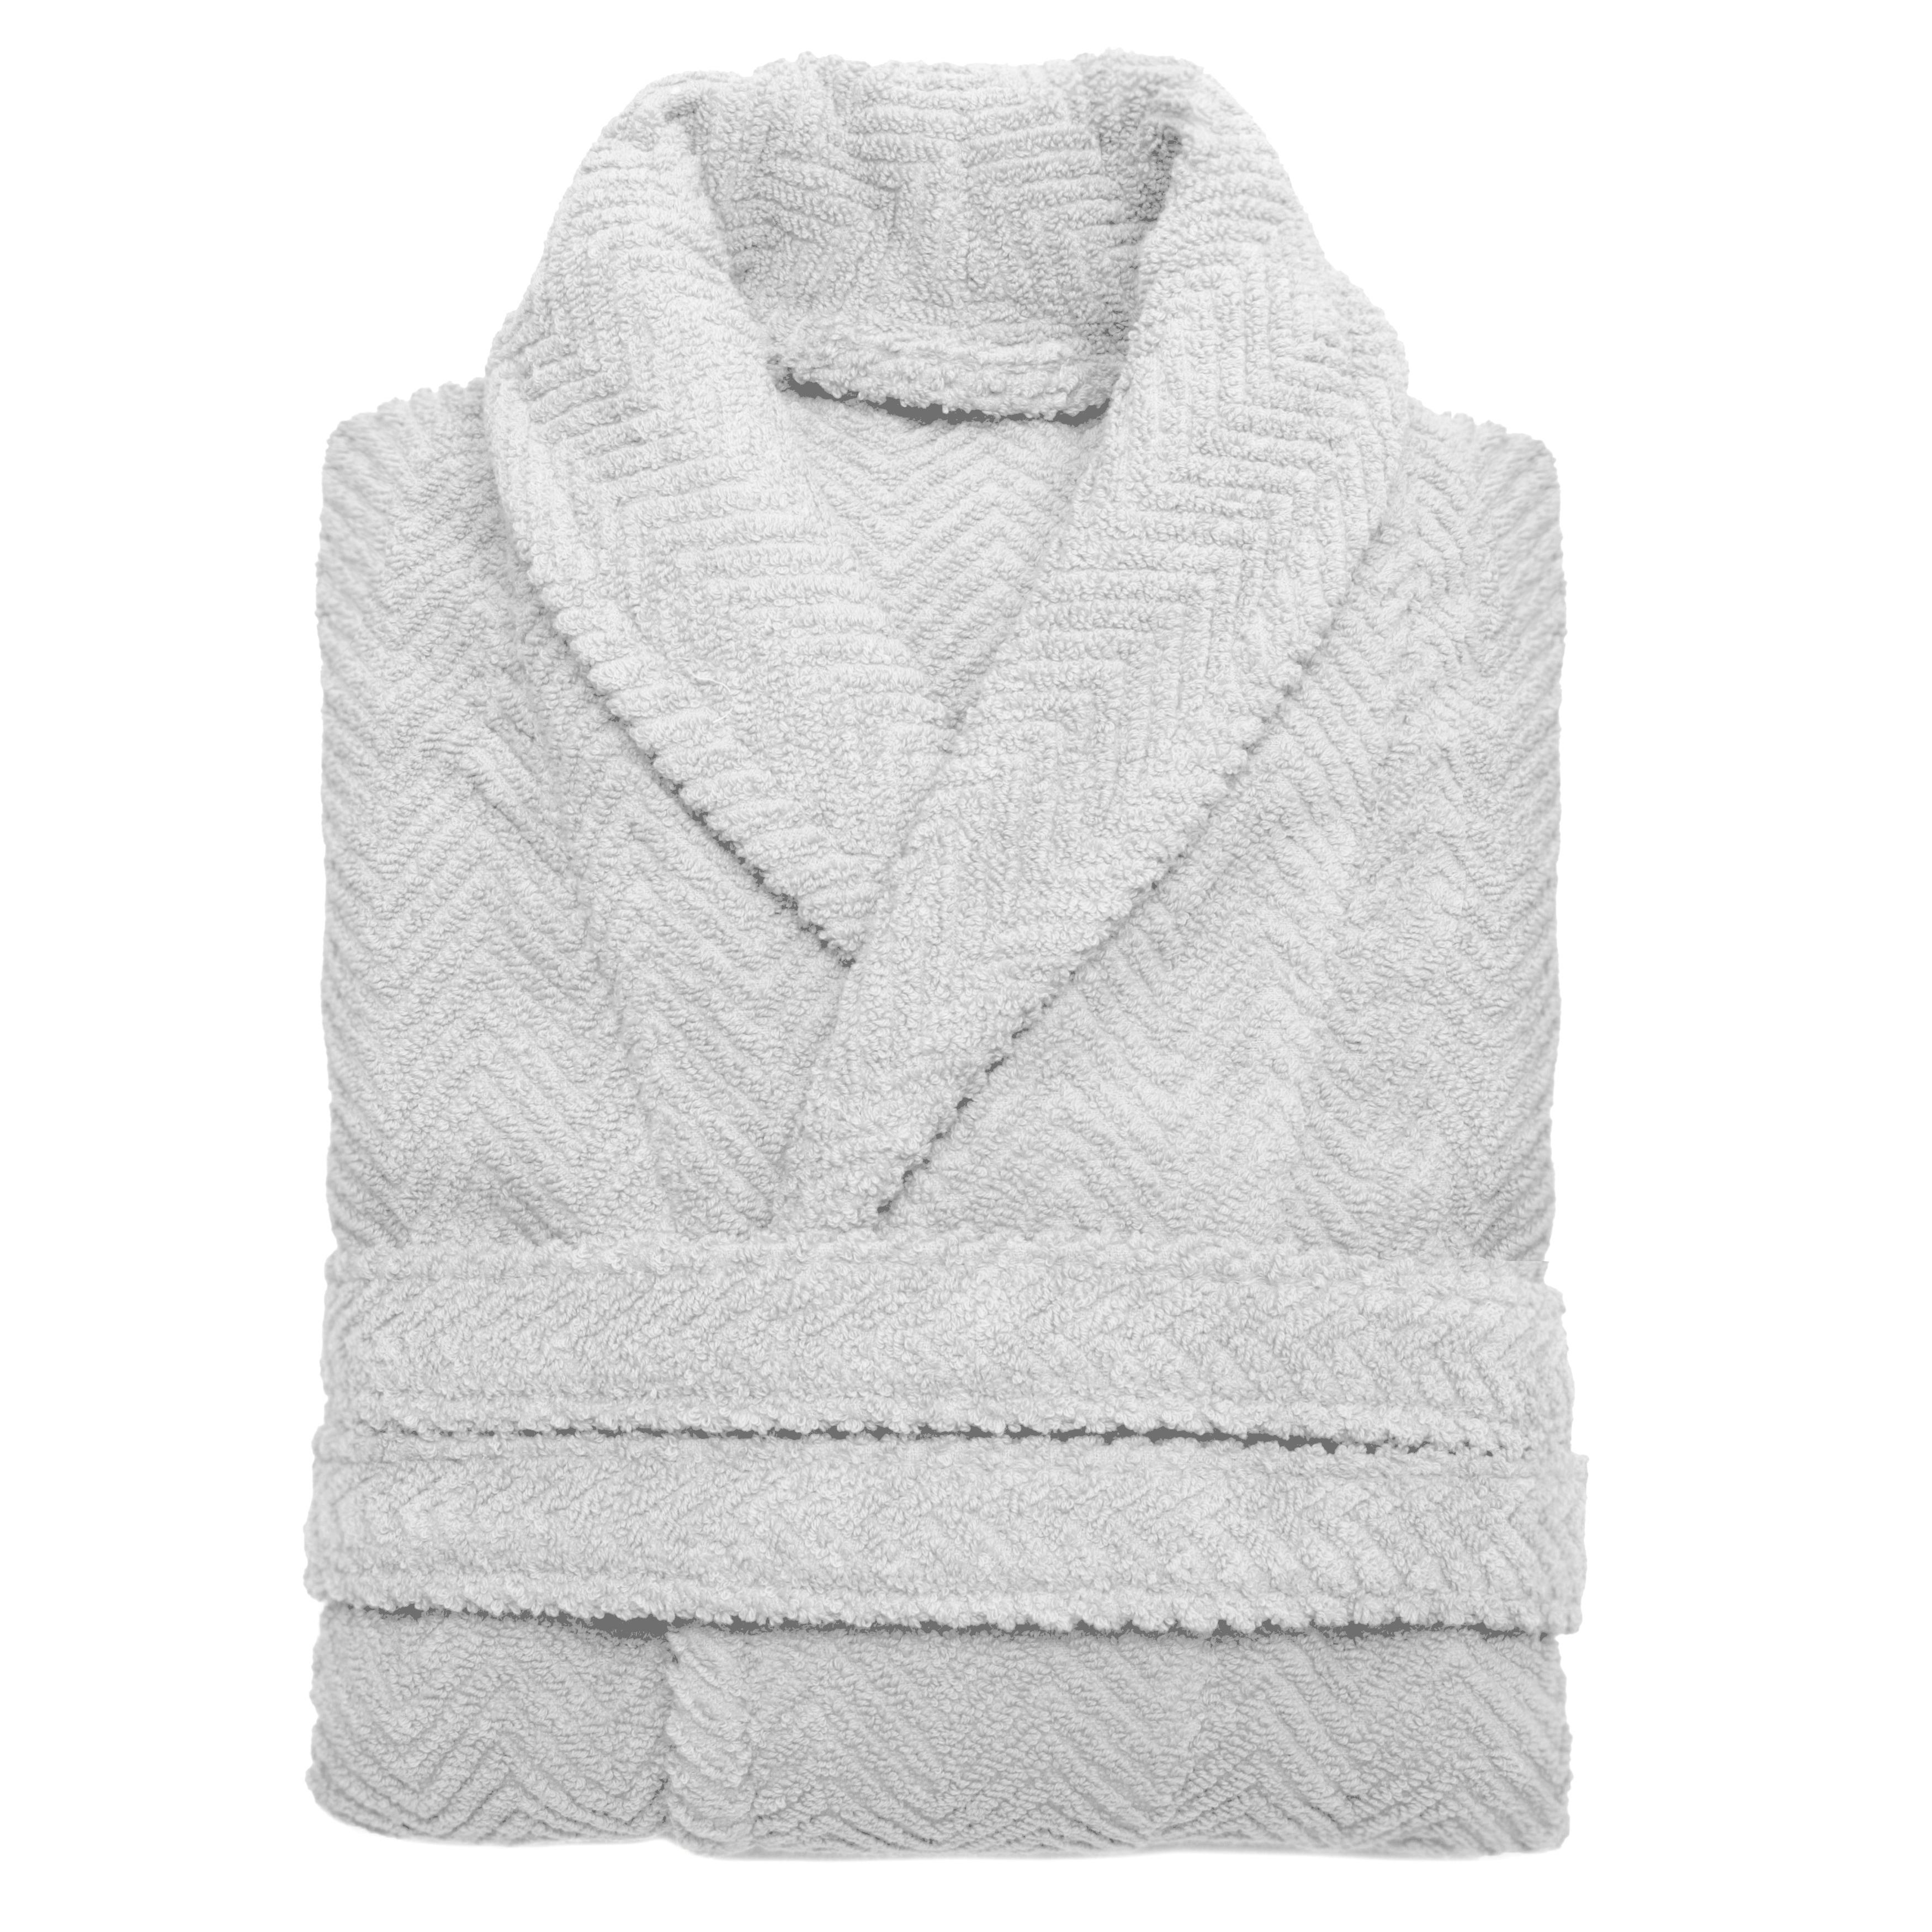 01e1b6db3fad Shop Authentic Hotel Spa Herringbone Weave Turkish Cotton Unisex Bath Robe  - On Sale - Free Shipping Today - Overstock - 7604182